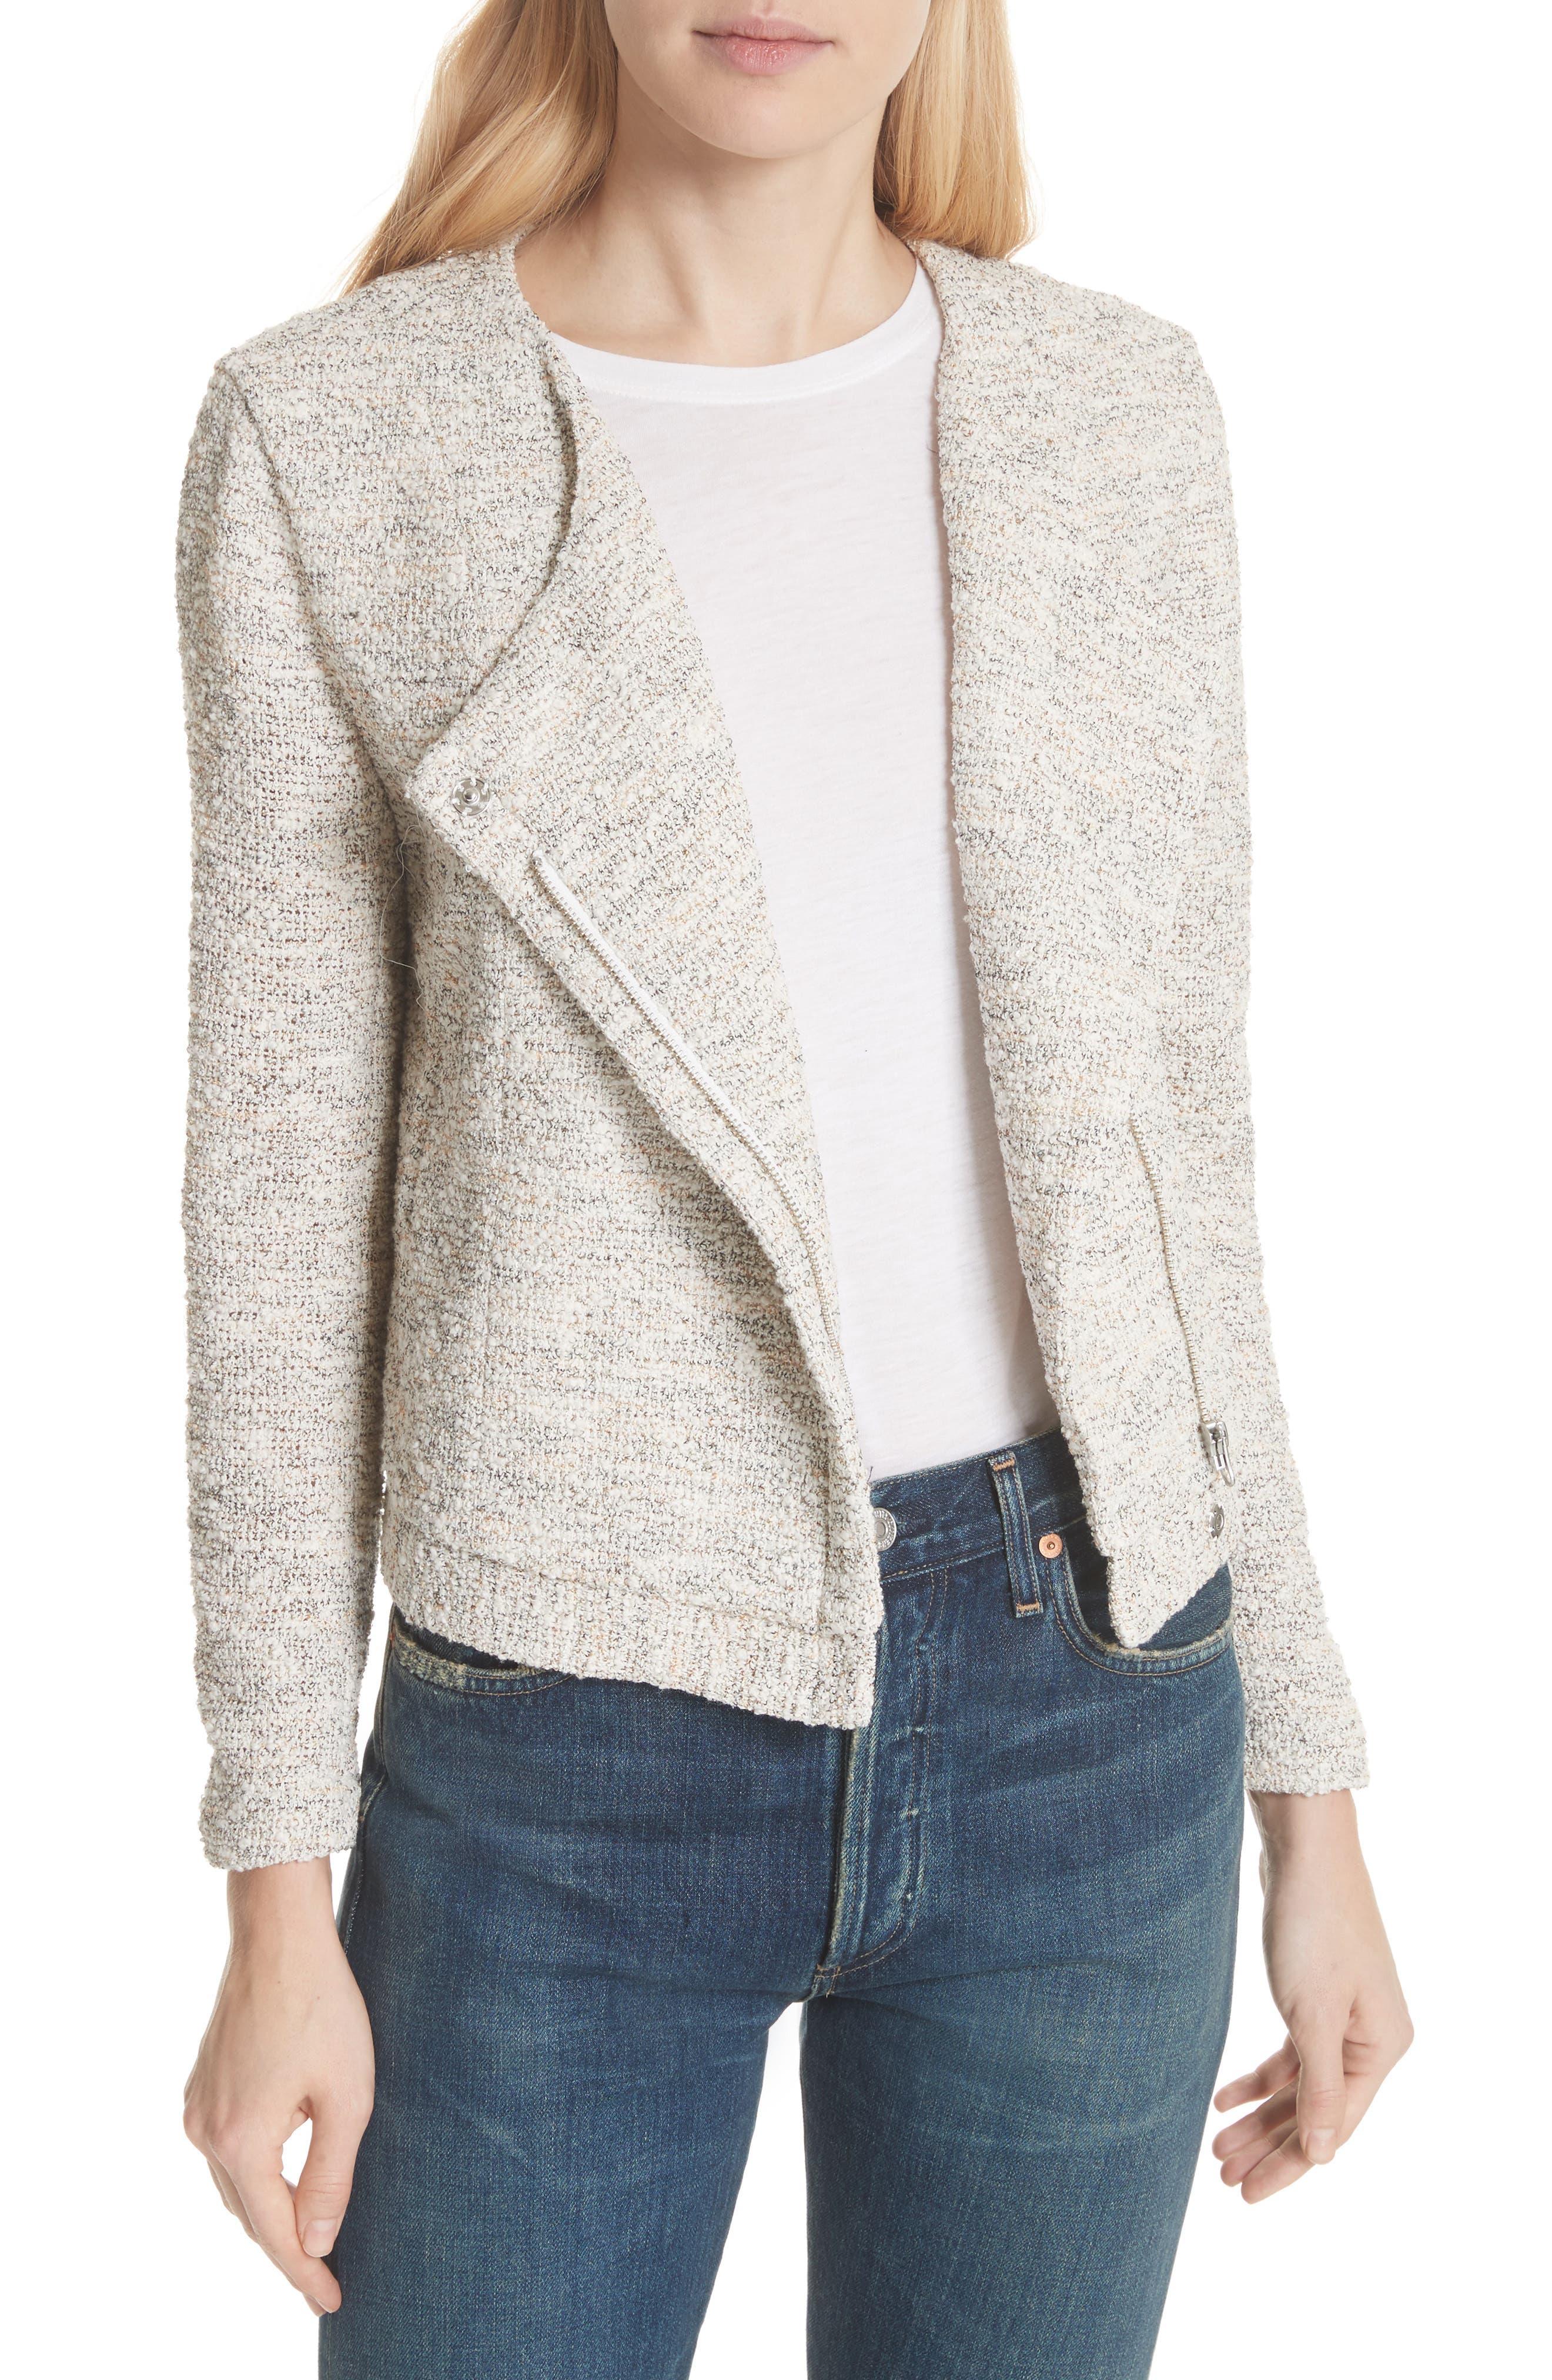 Main Image - Joie 'Balina' Tweed Jacket